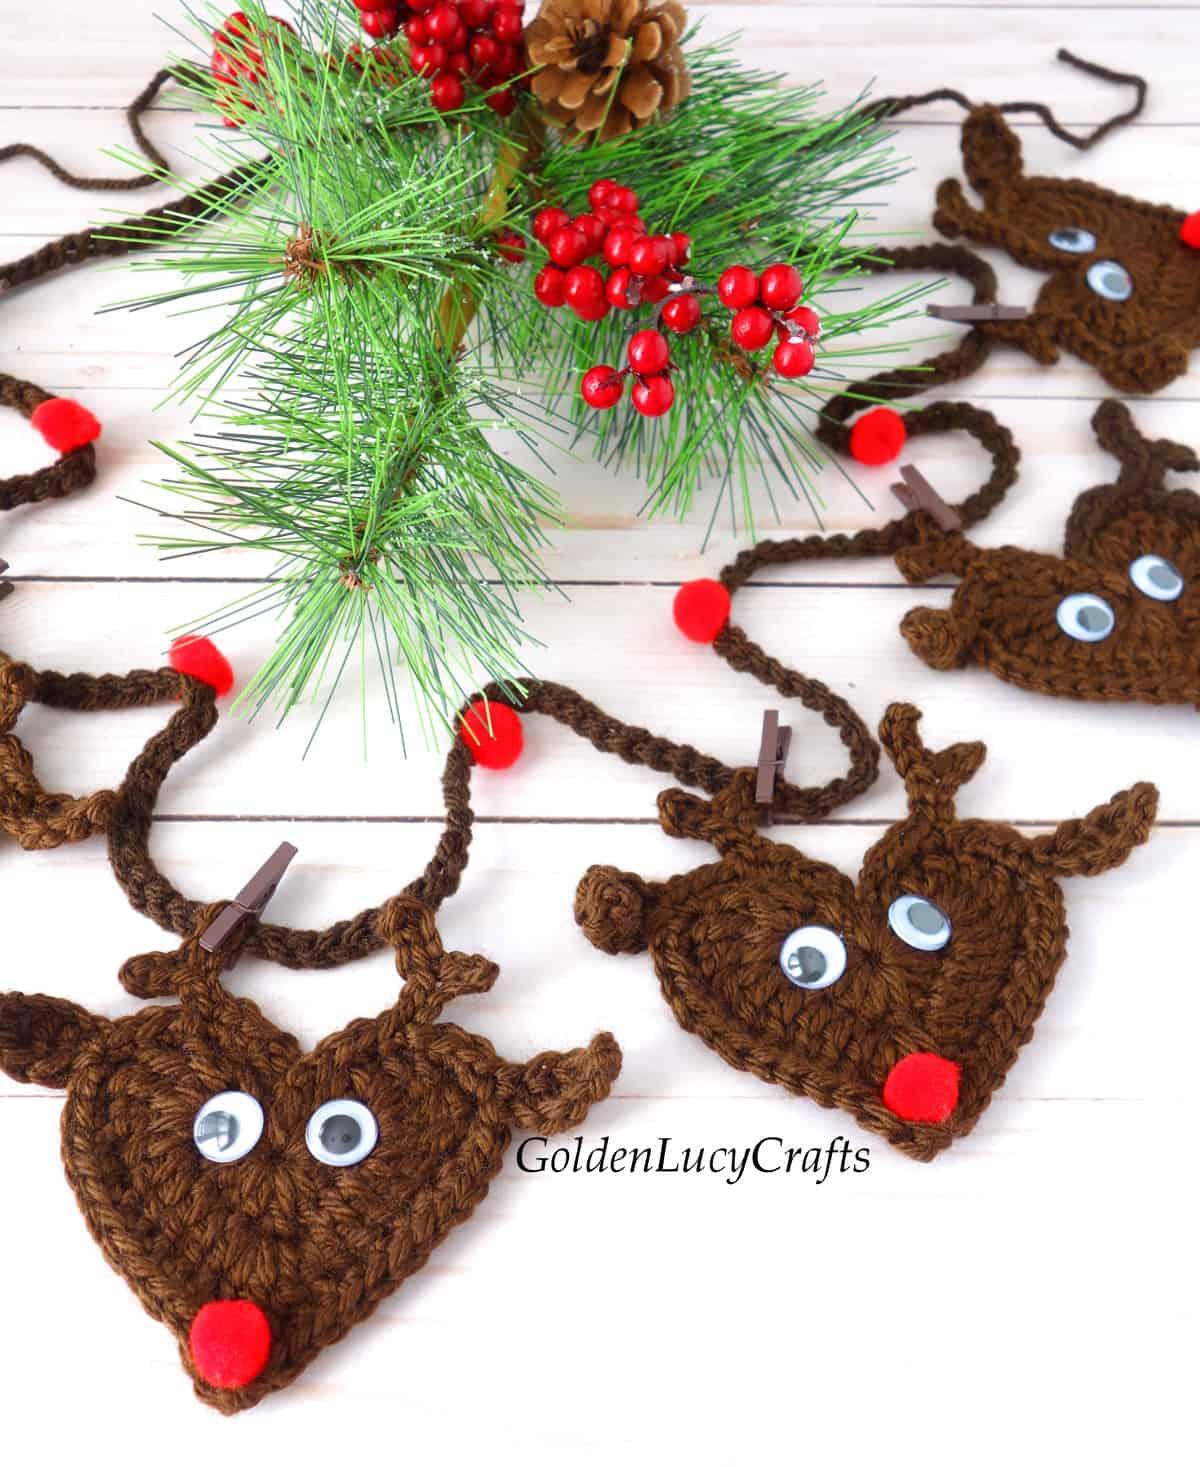 Crochet reindeer garland